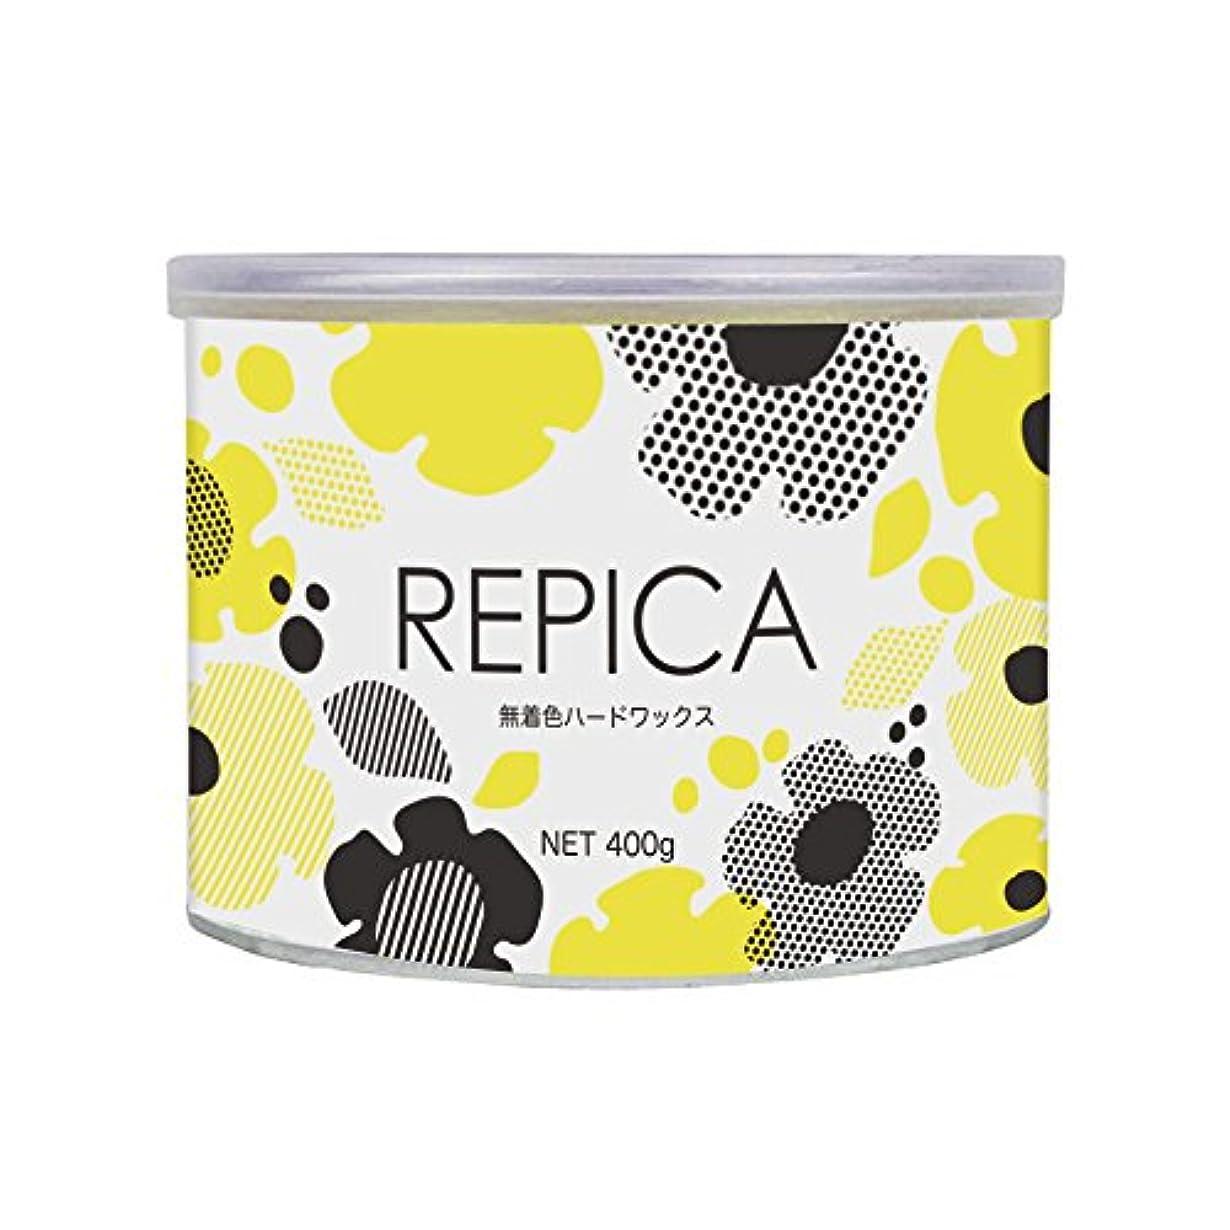 REPICA 無着色ハードワックス 敏感肌用 400ml ブラジリアンワックス脱毛 1個